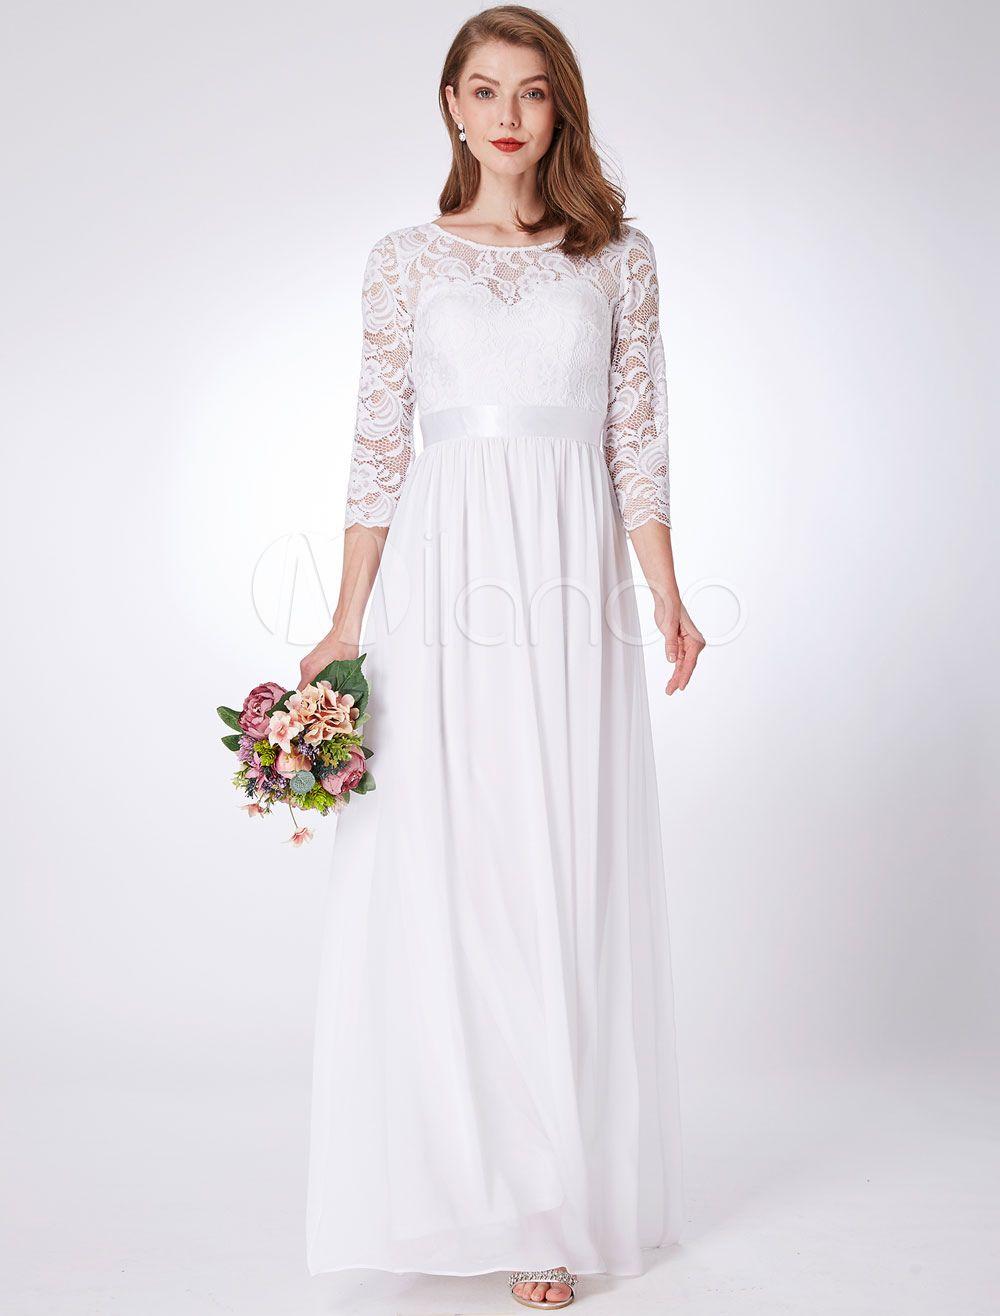 Bridesmaid dresses white lace chiffon half sleeve long prom dress